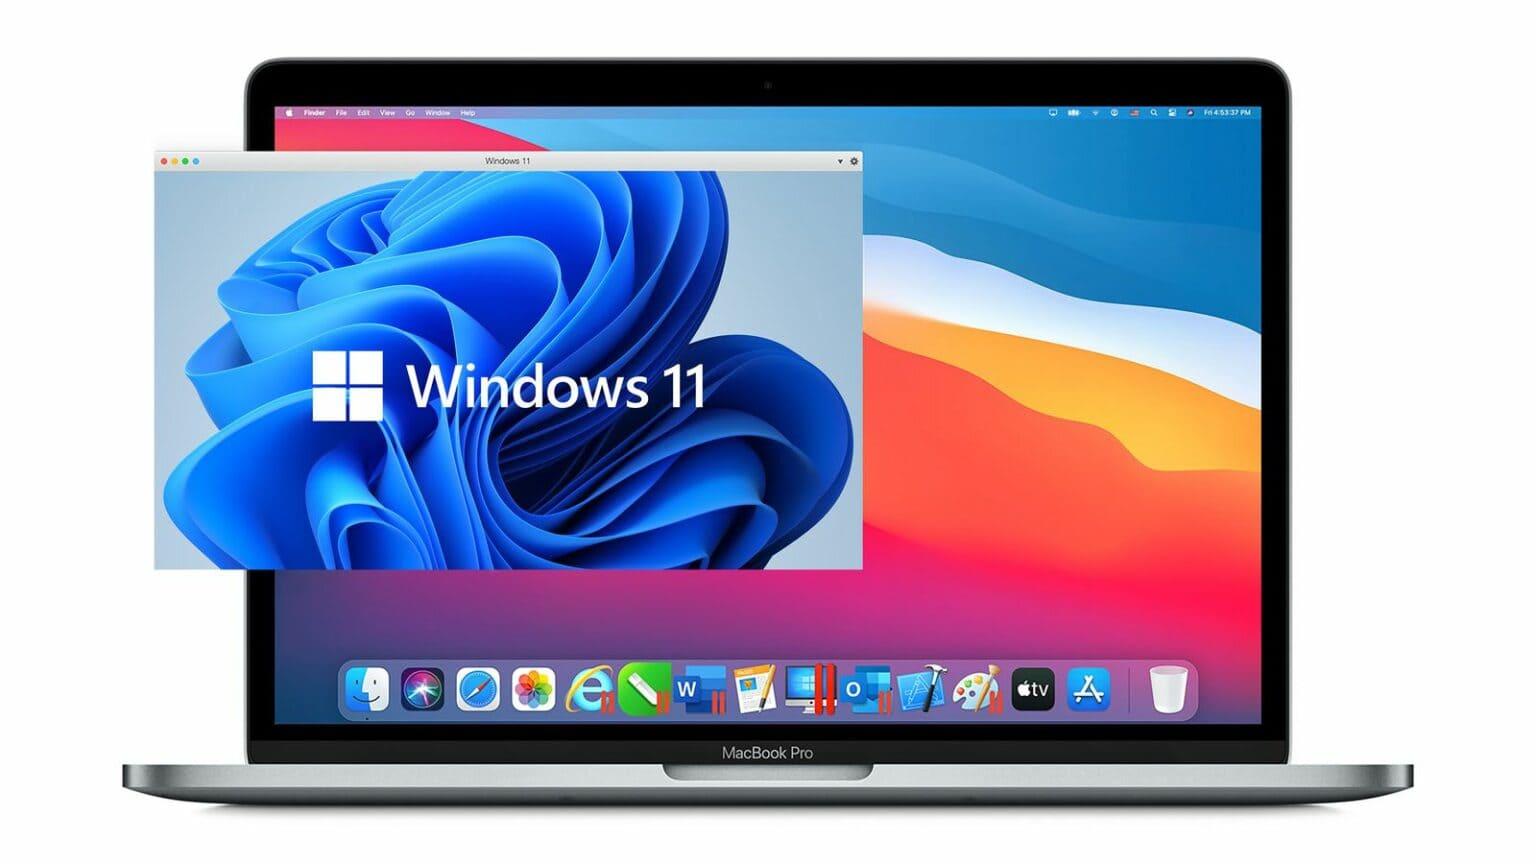 Parallels Desktop with Windows 11